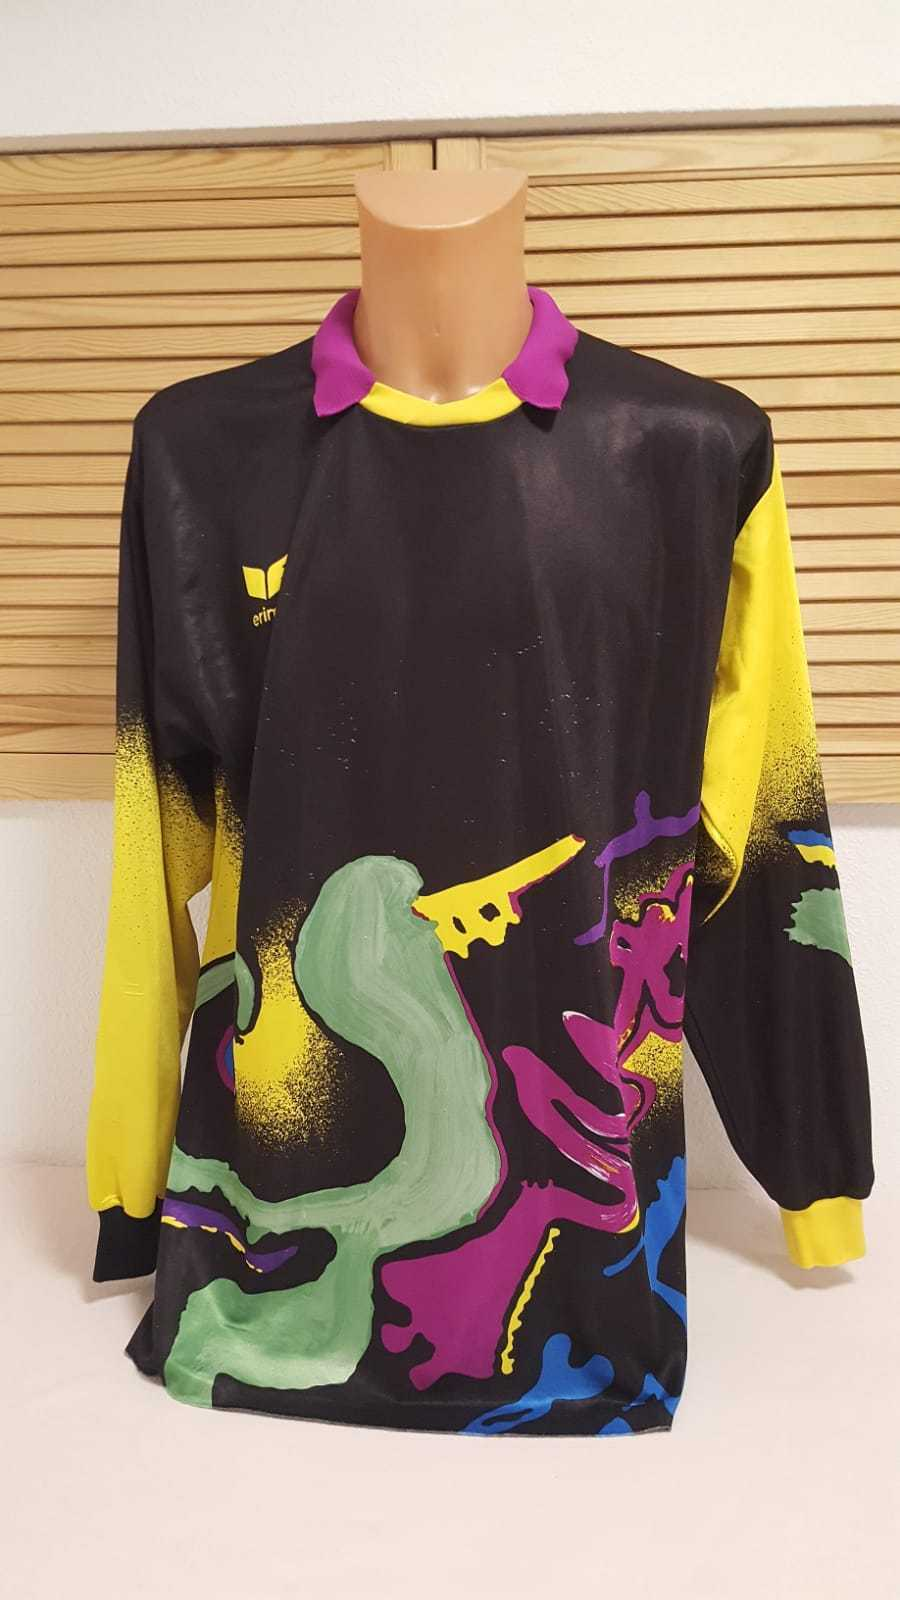 Erima Vintage Retro Torwart Trikot Shirt Jersey Camisola Goalkeeper Maglia XL